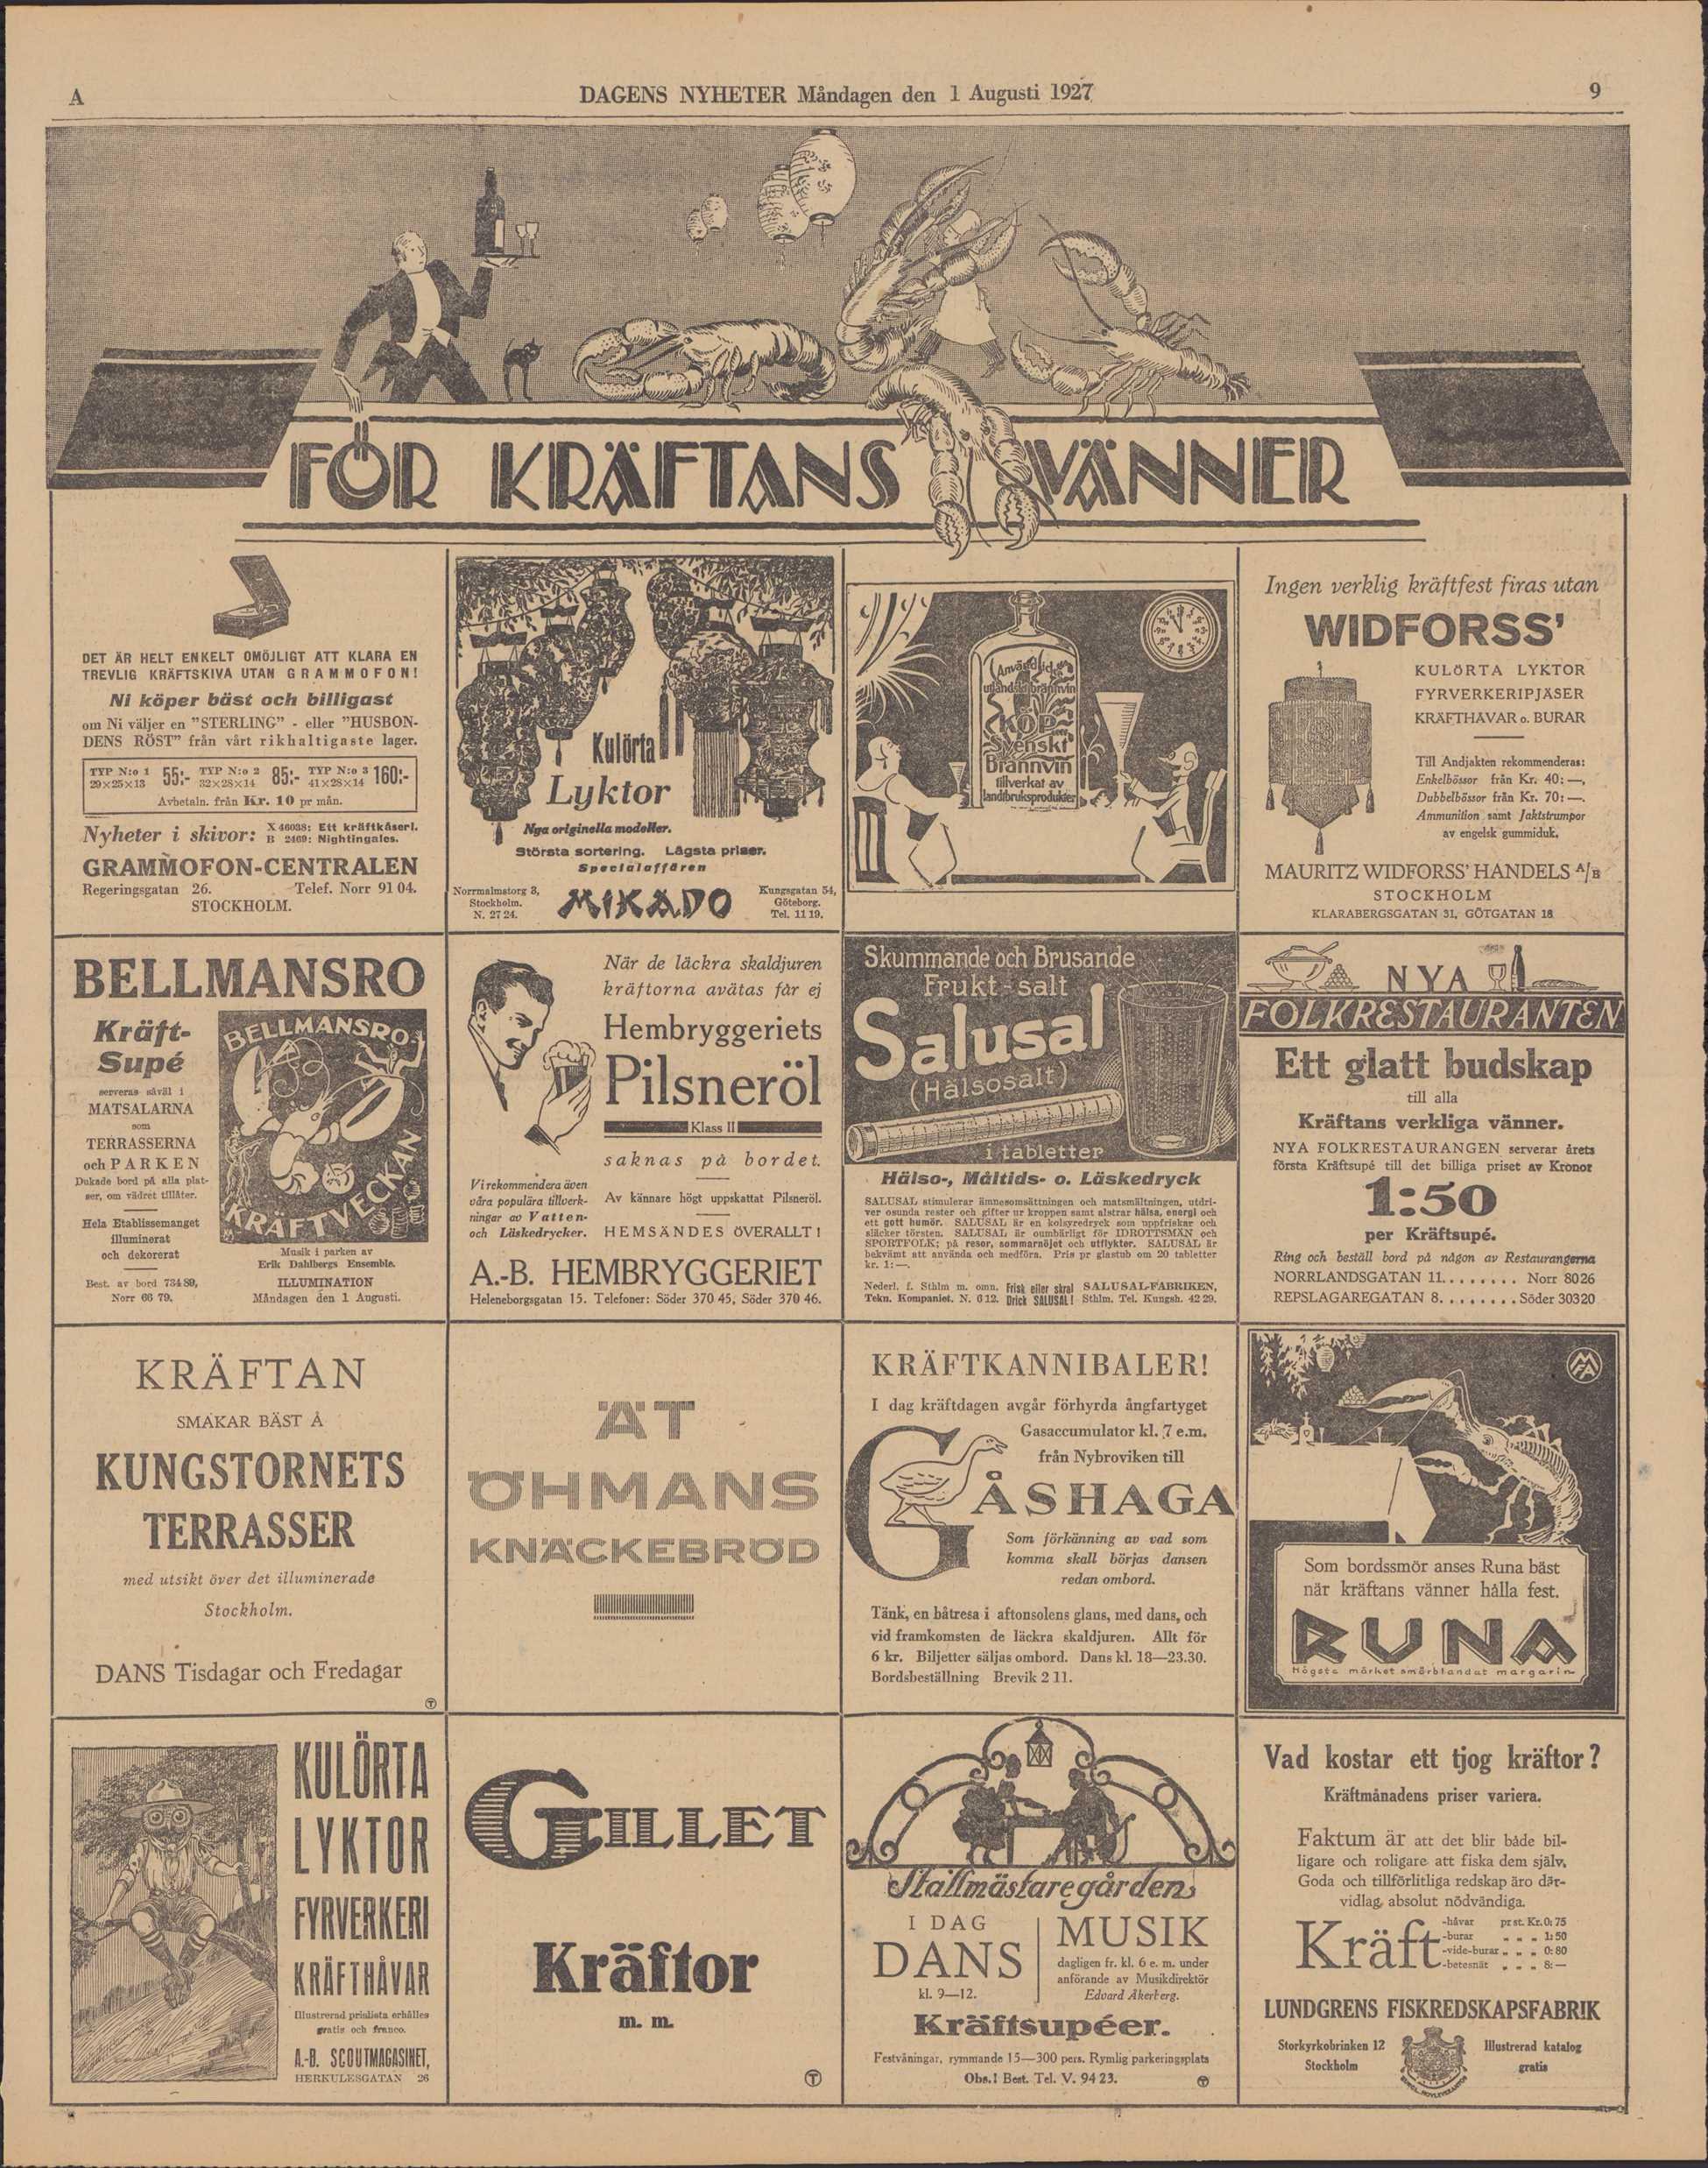 helbild-dagens-nyheter-mandag-1-augusti-1927-sida-9_1950.jpeg